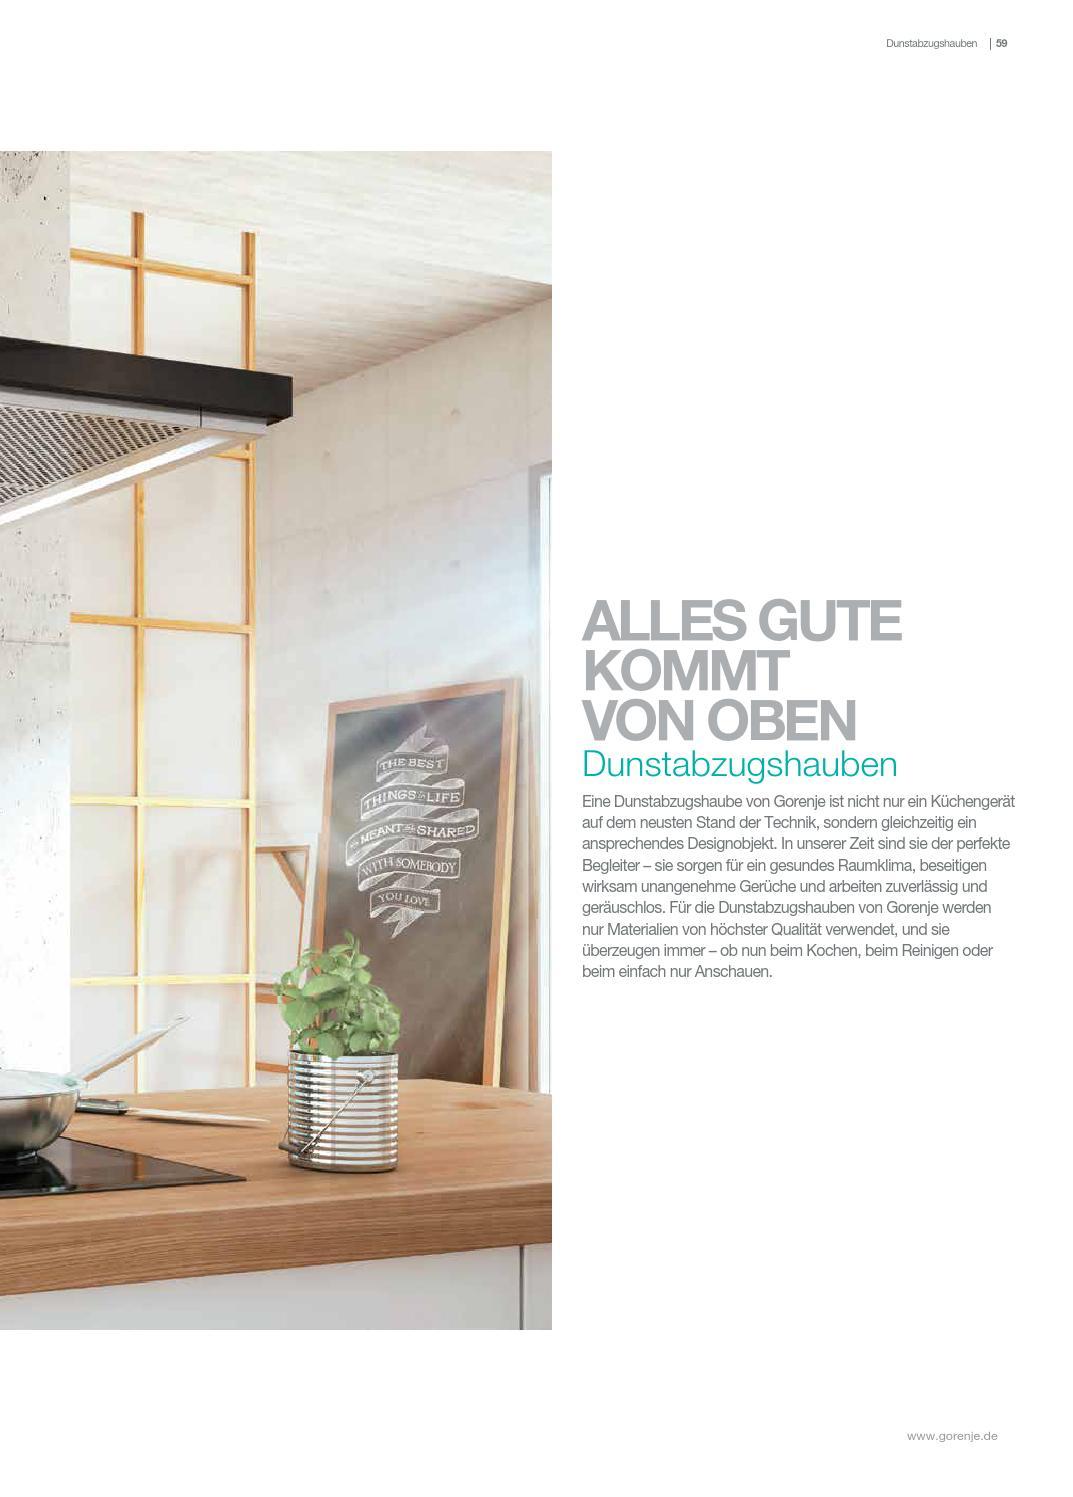 Katalog Einbaugerate 2015 By Gorenje D D Issuu